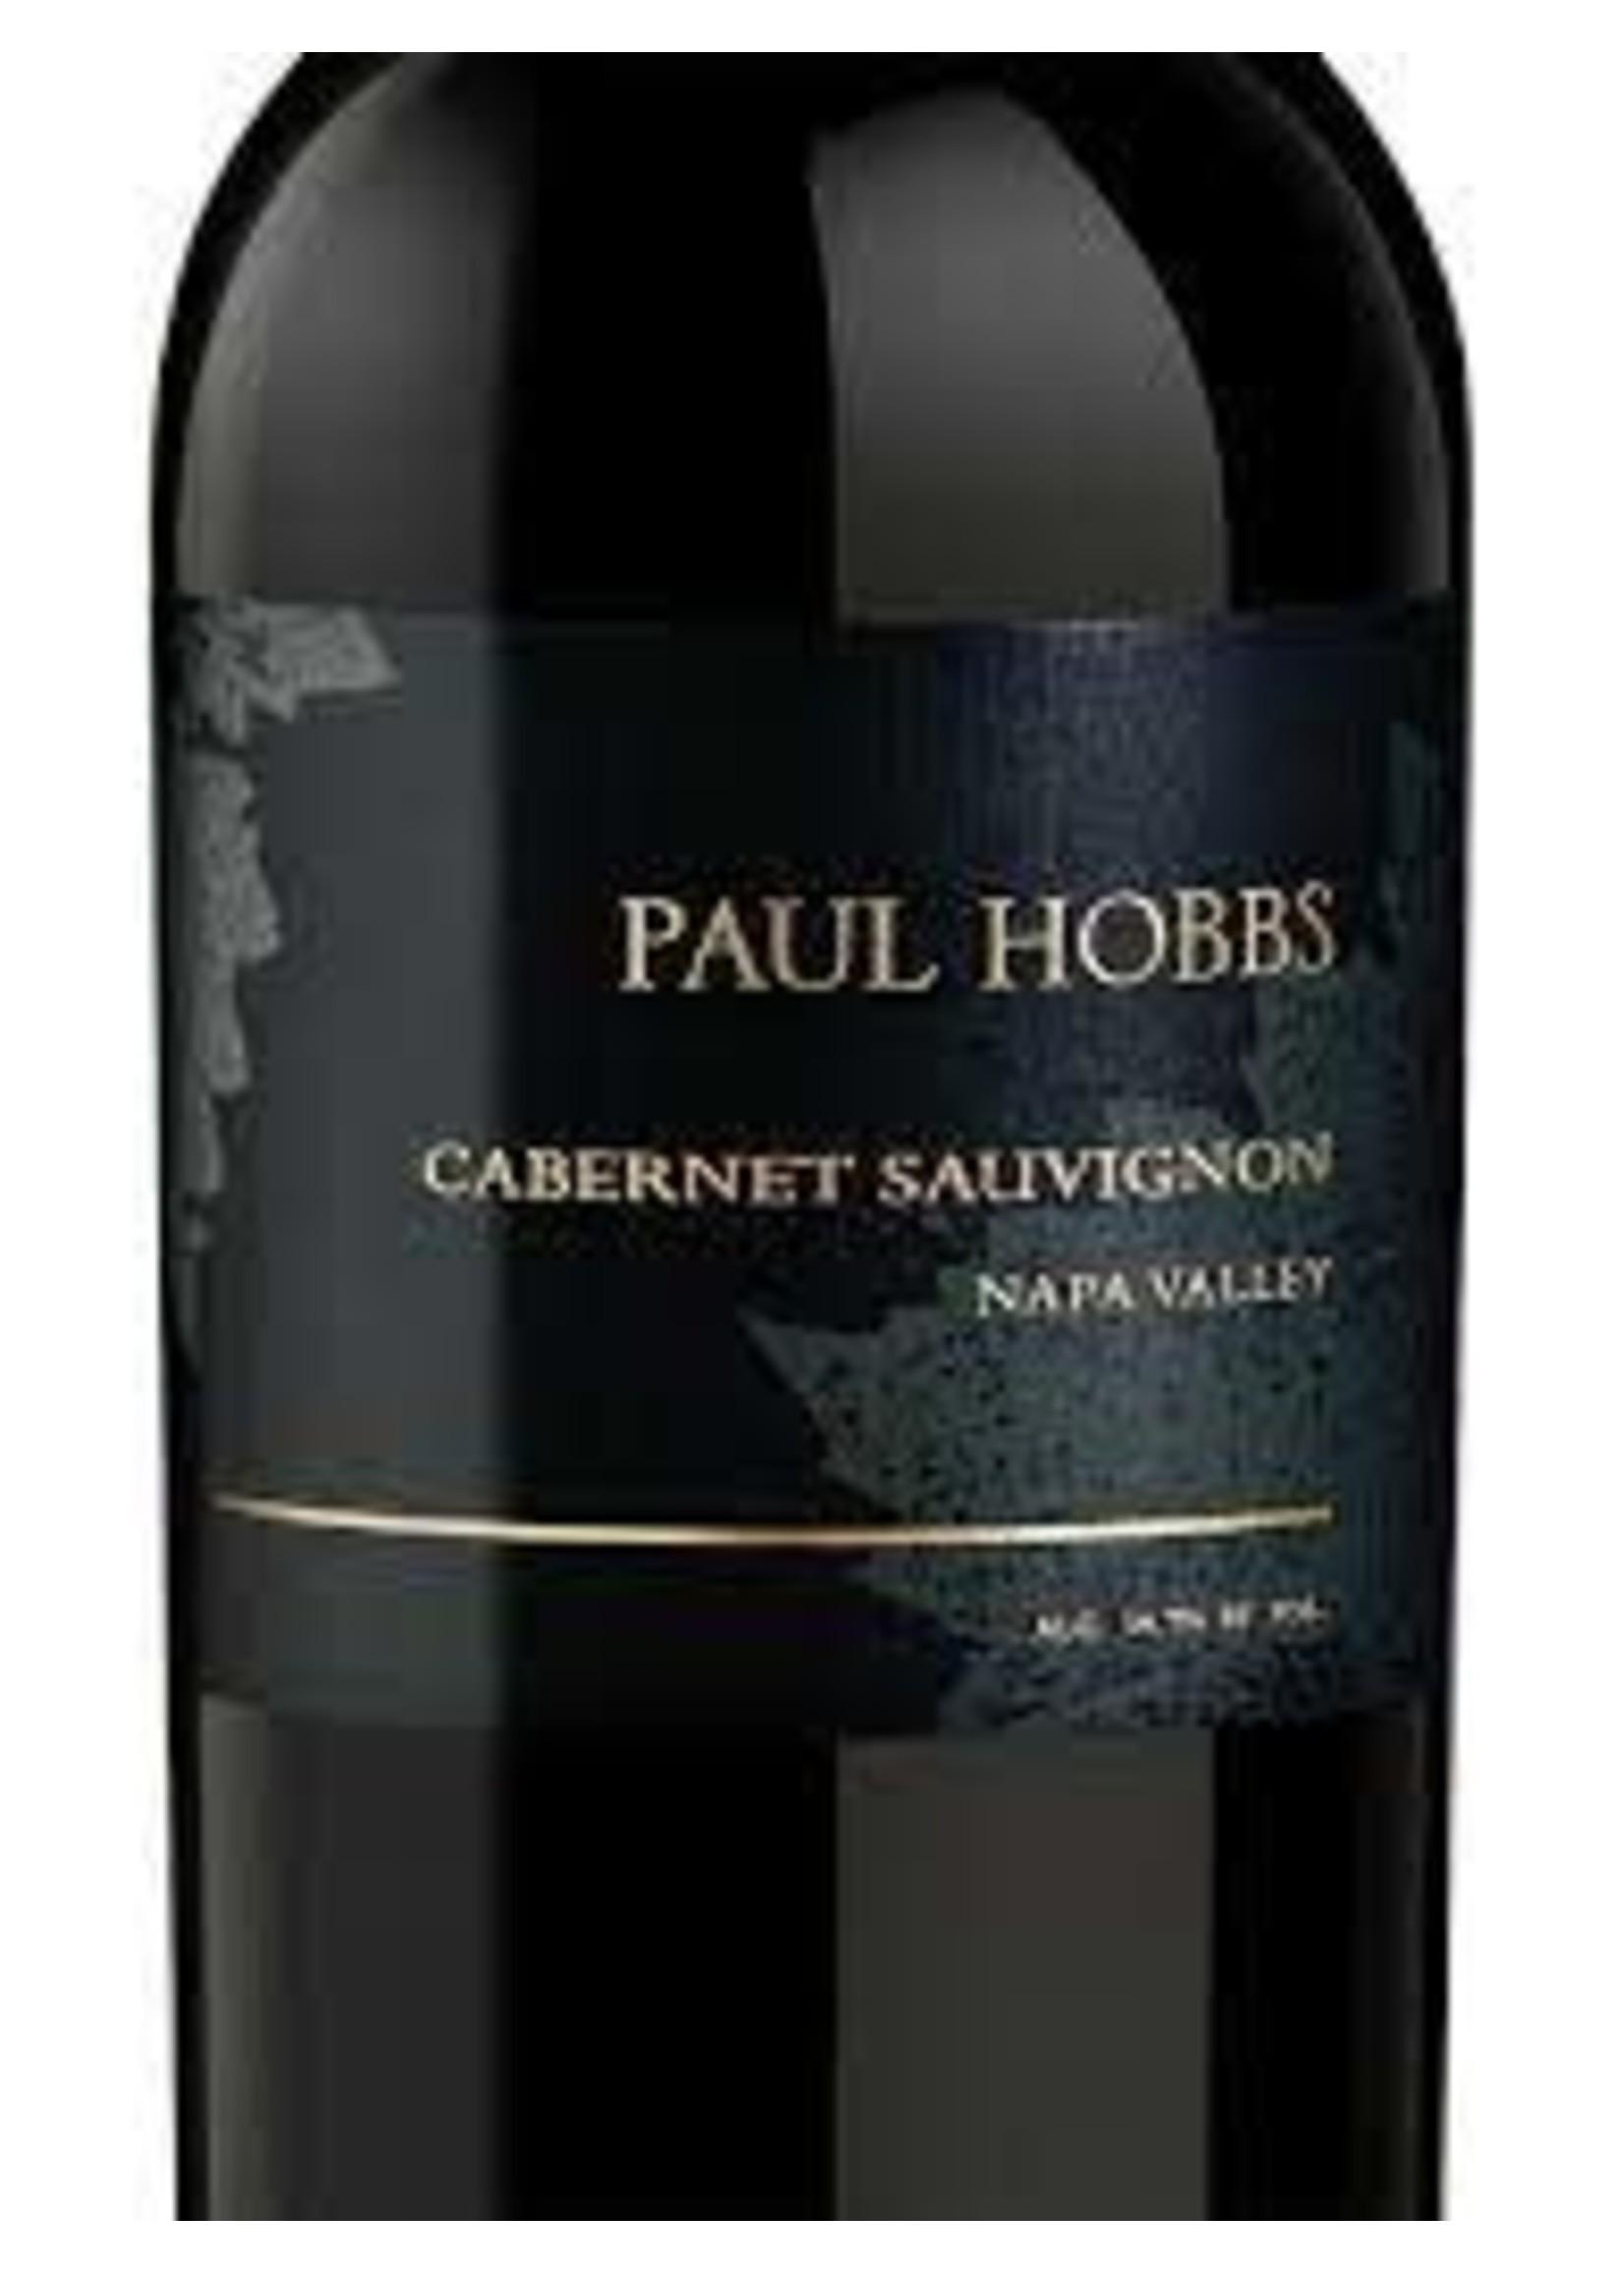 Paul Hobbs 2016 Cabernet Sauvignon Napa 750ml